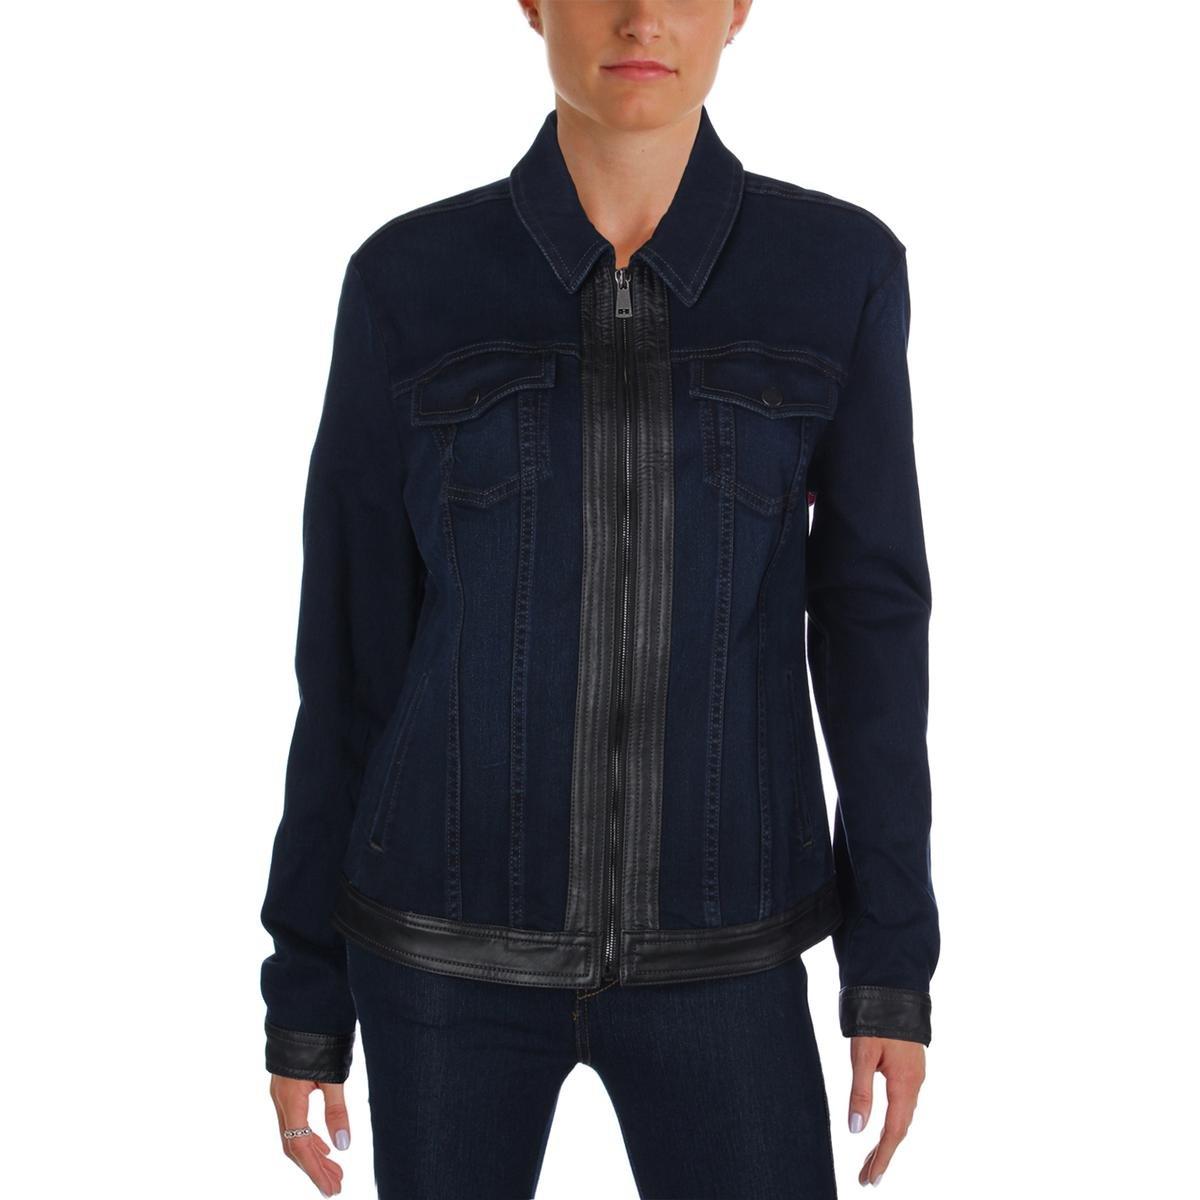 NYDJ Women's Veronica Jeans Jacket In Future Fit Denim, Paris Nights, Medium